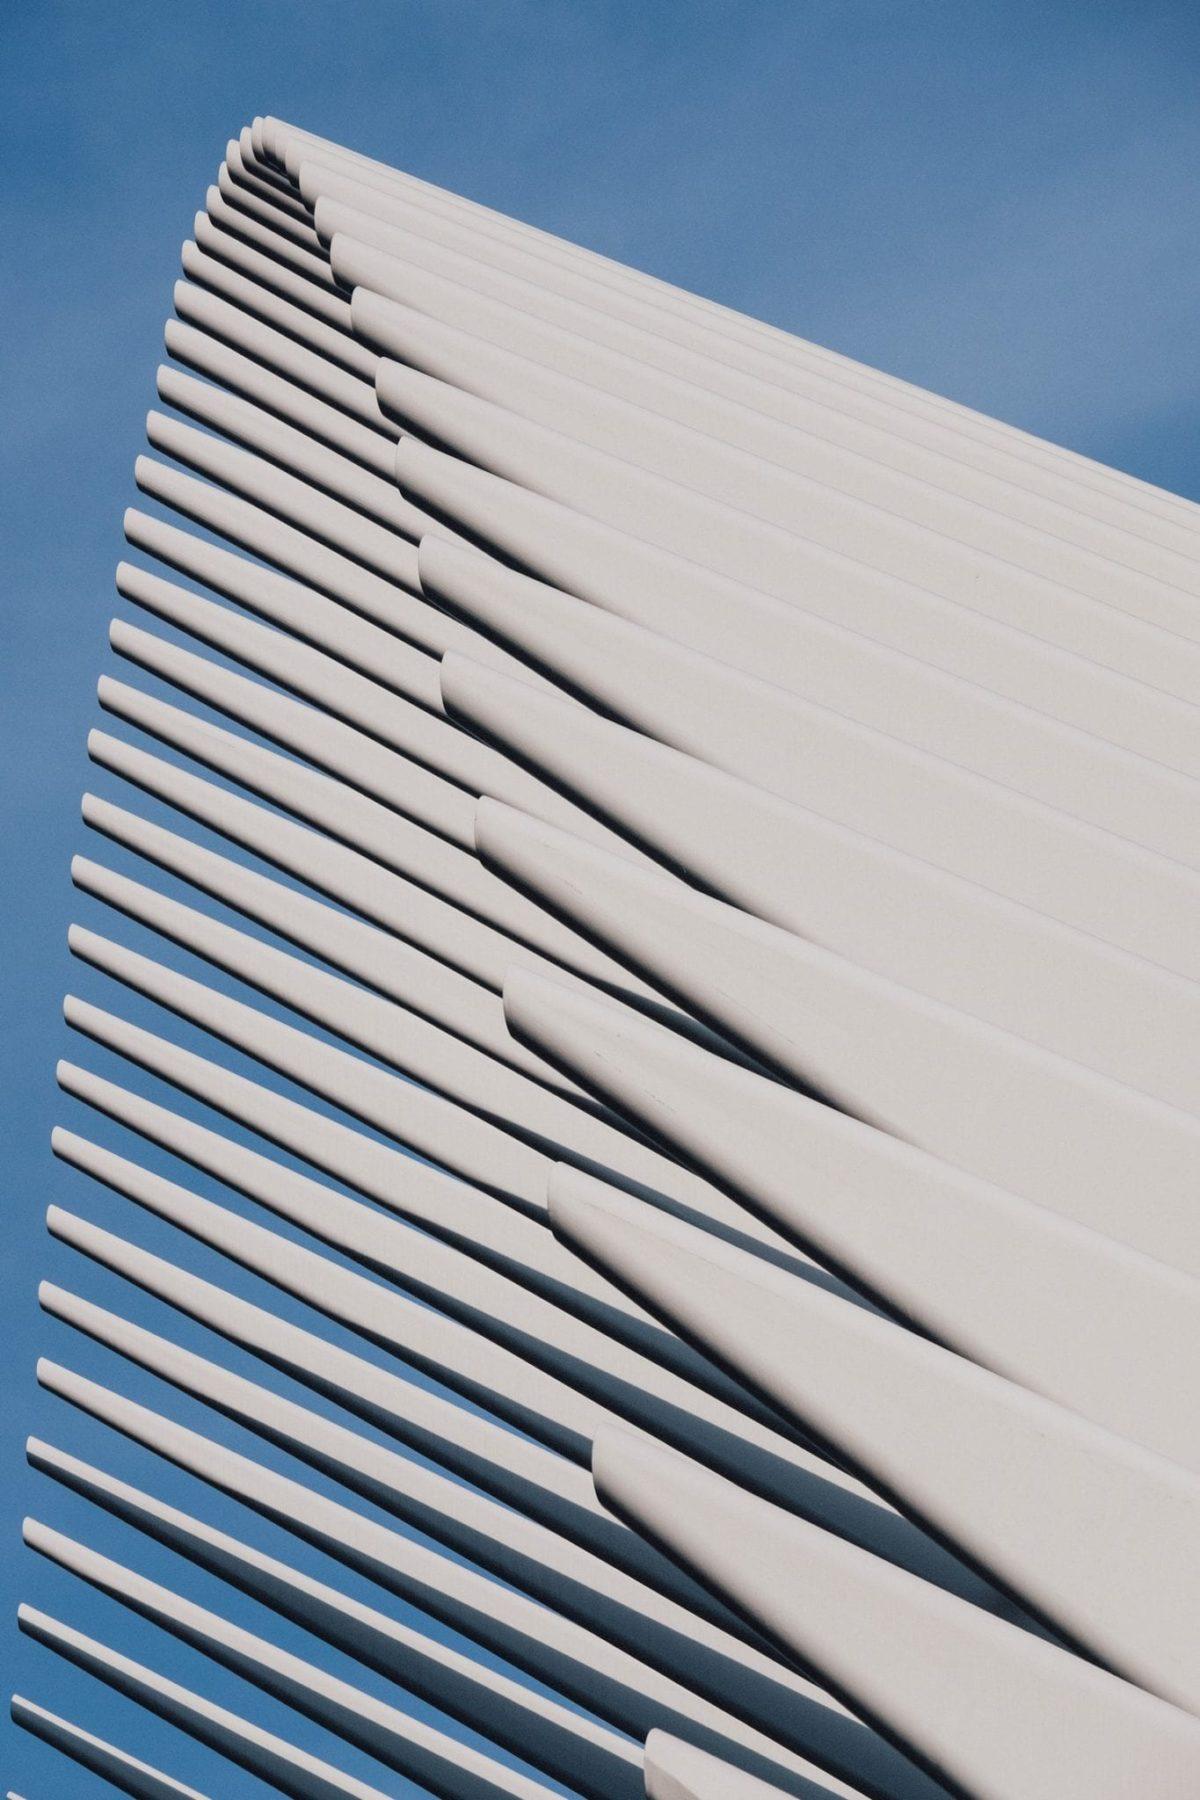 NYC Oculus WTC11